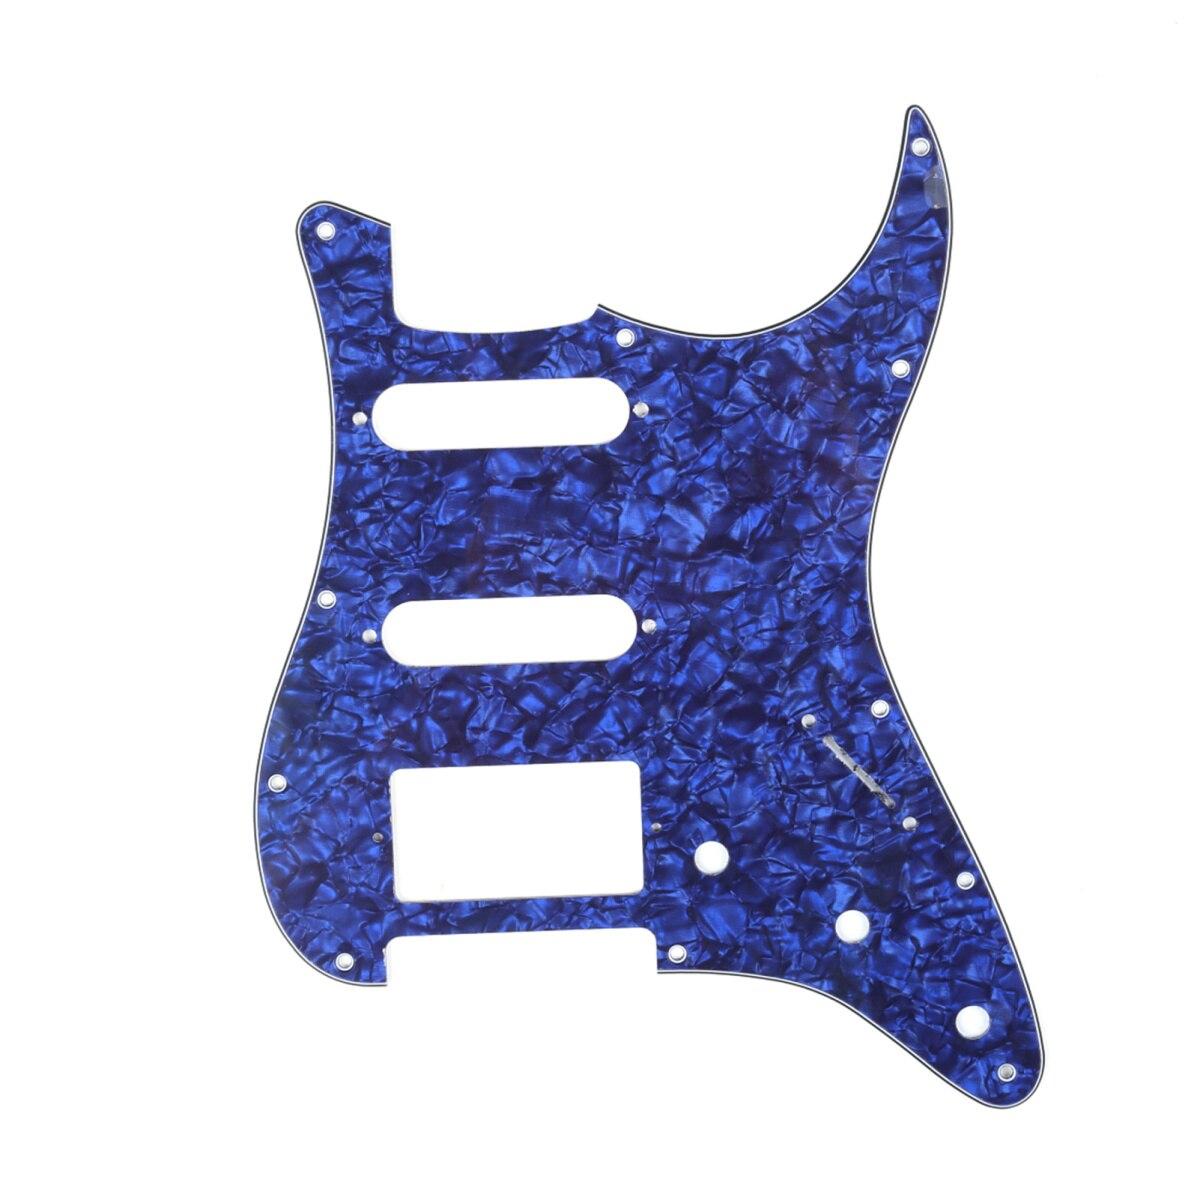 Musiclily HSS golpeador de guitarra de 11 agujeros Strat para Fender USA/mexicana...